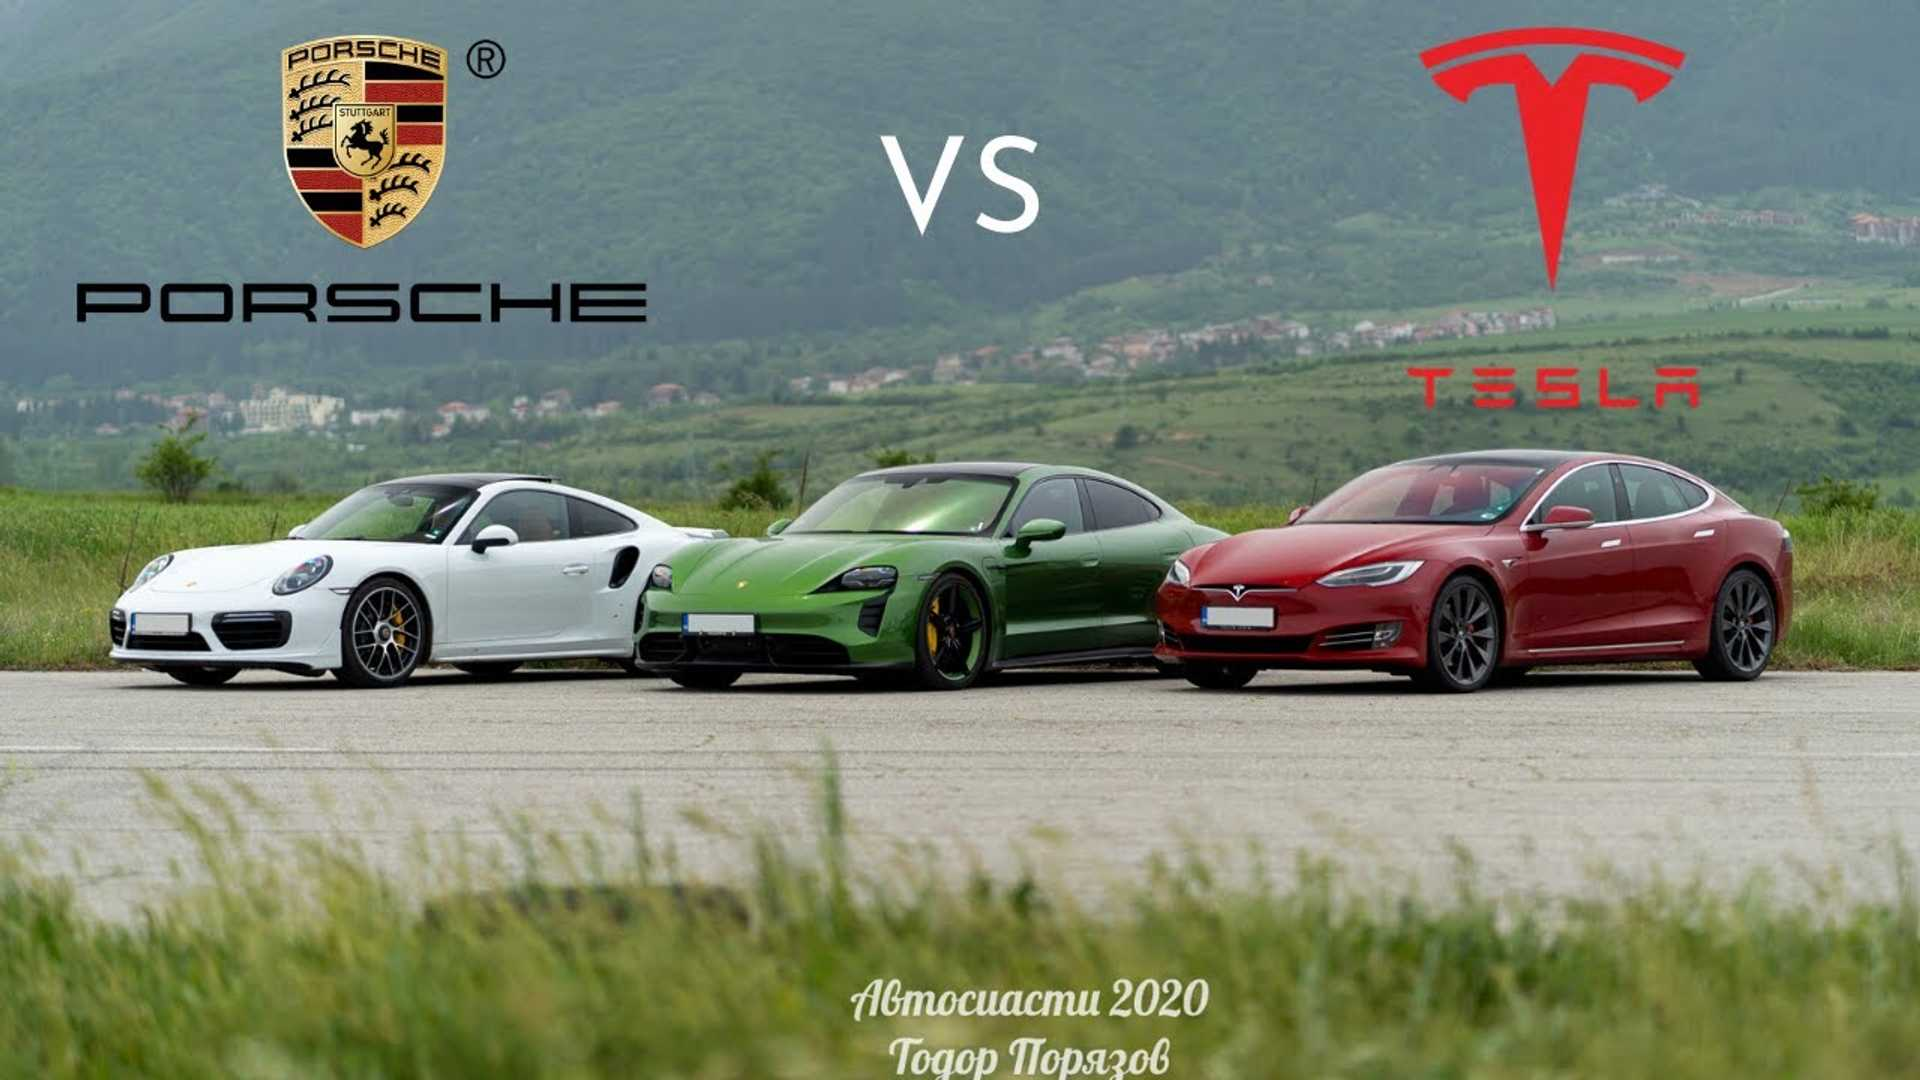 Часы Tesla Модель S P100D против Porsche Taycan Turbo S Drag Race